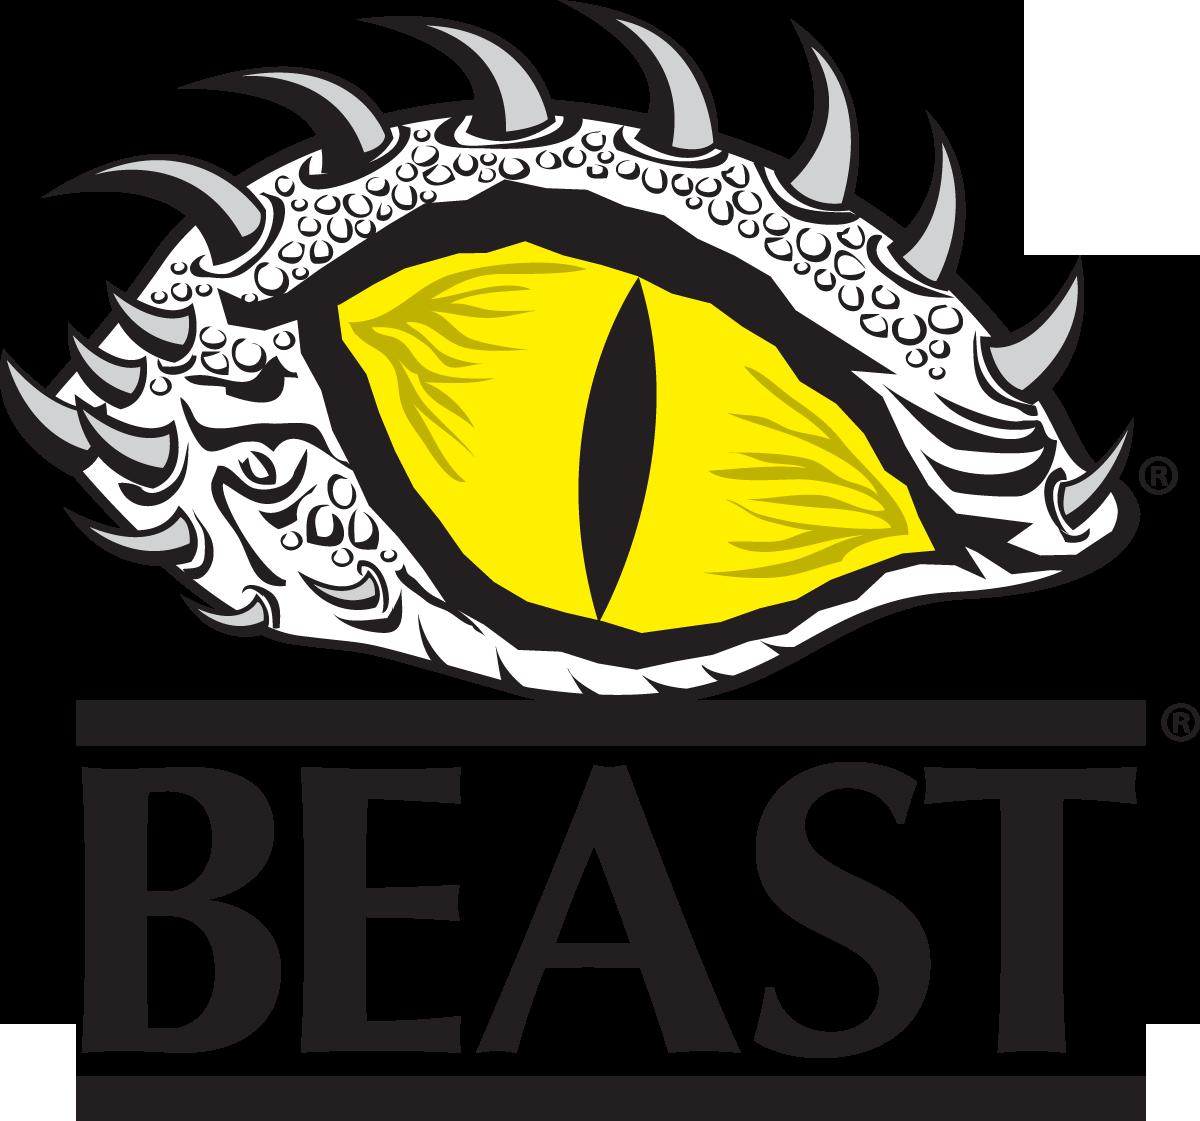 beast_logo-1.png